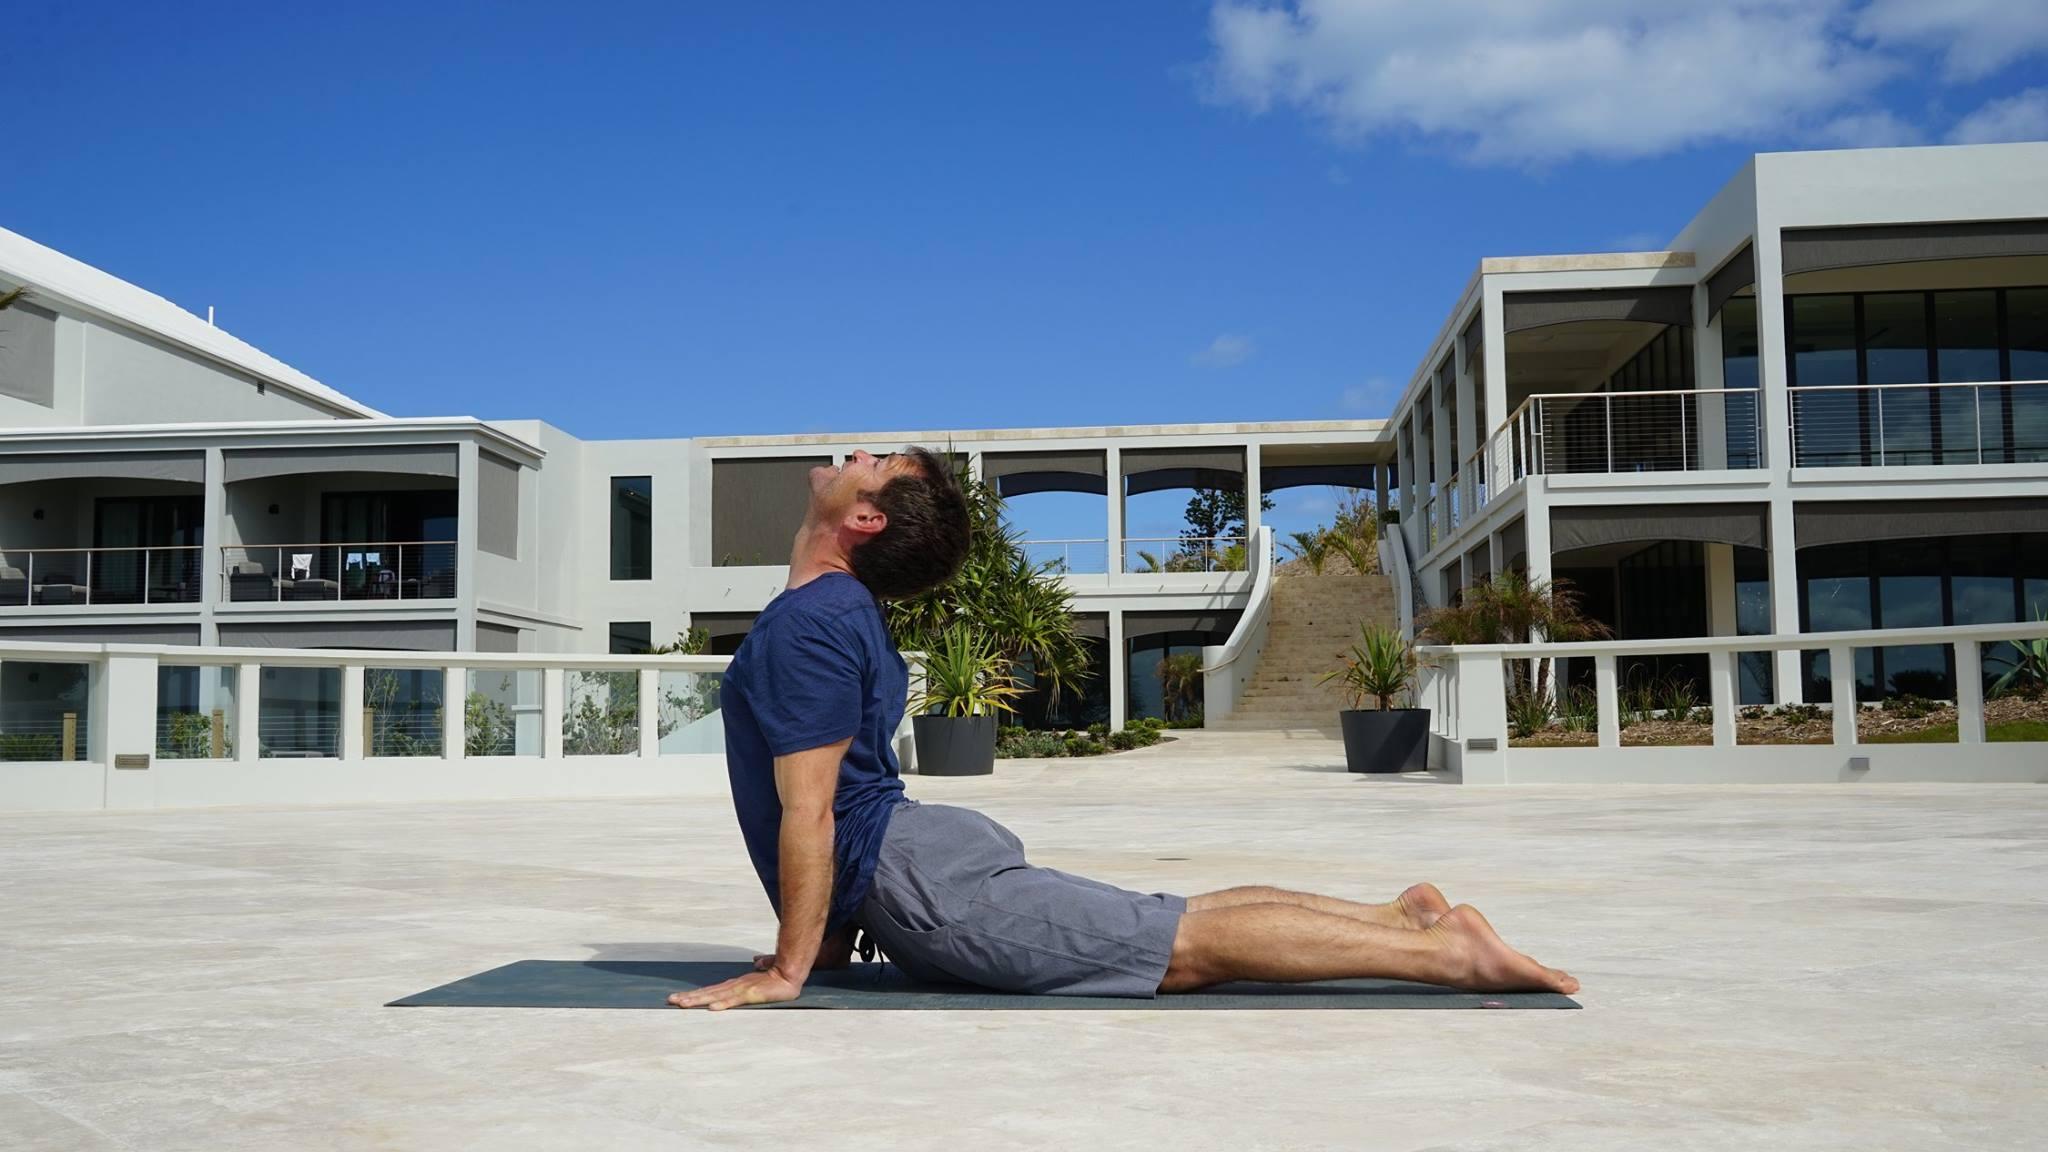 Bermuda - Todd Crews Yoga 15